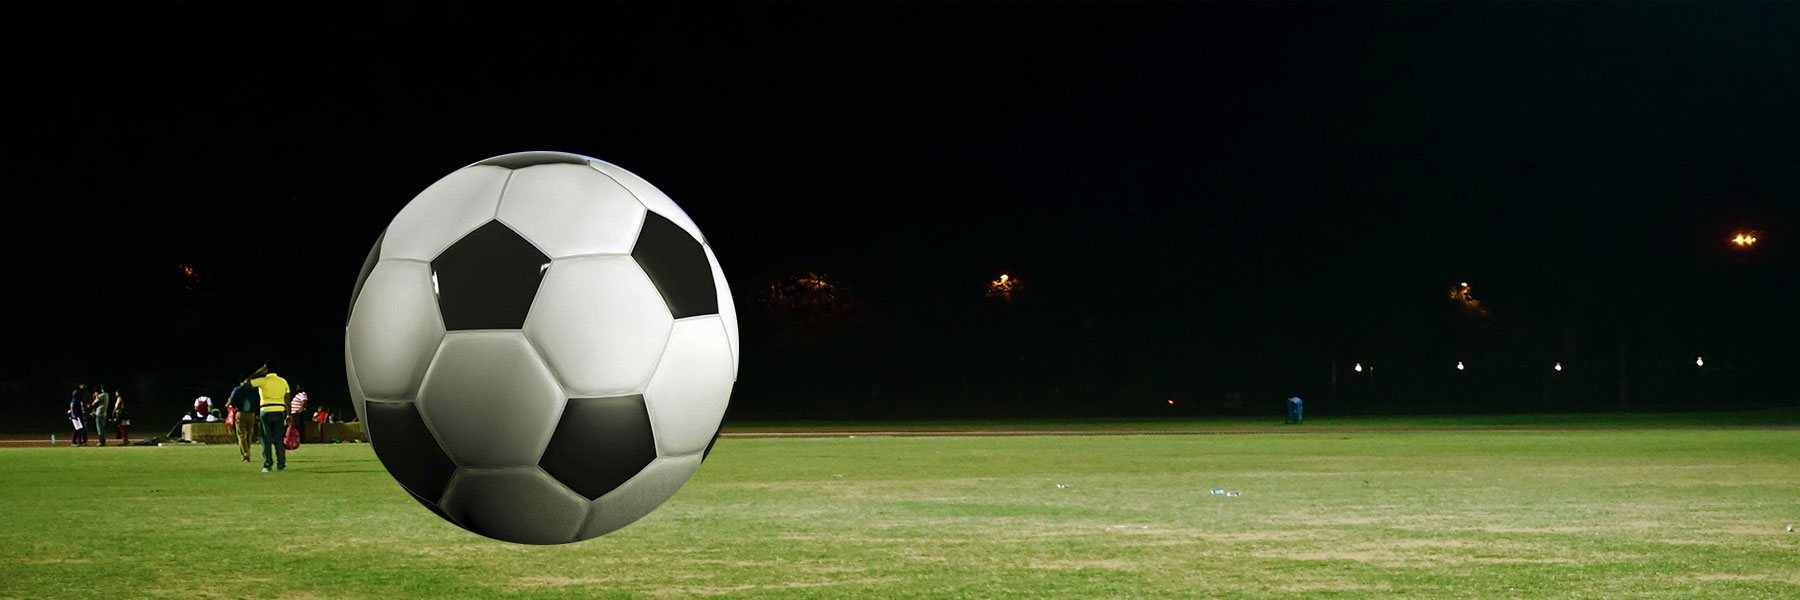 Soccer League Management Software